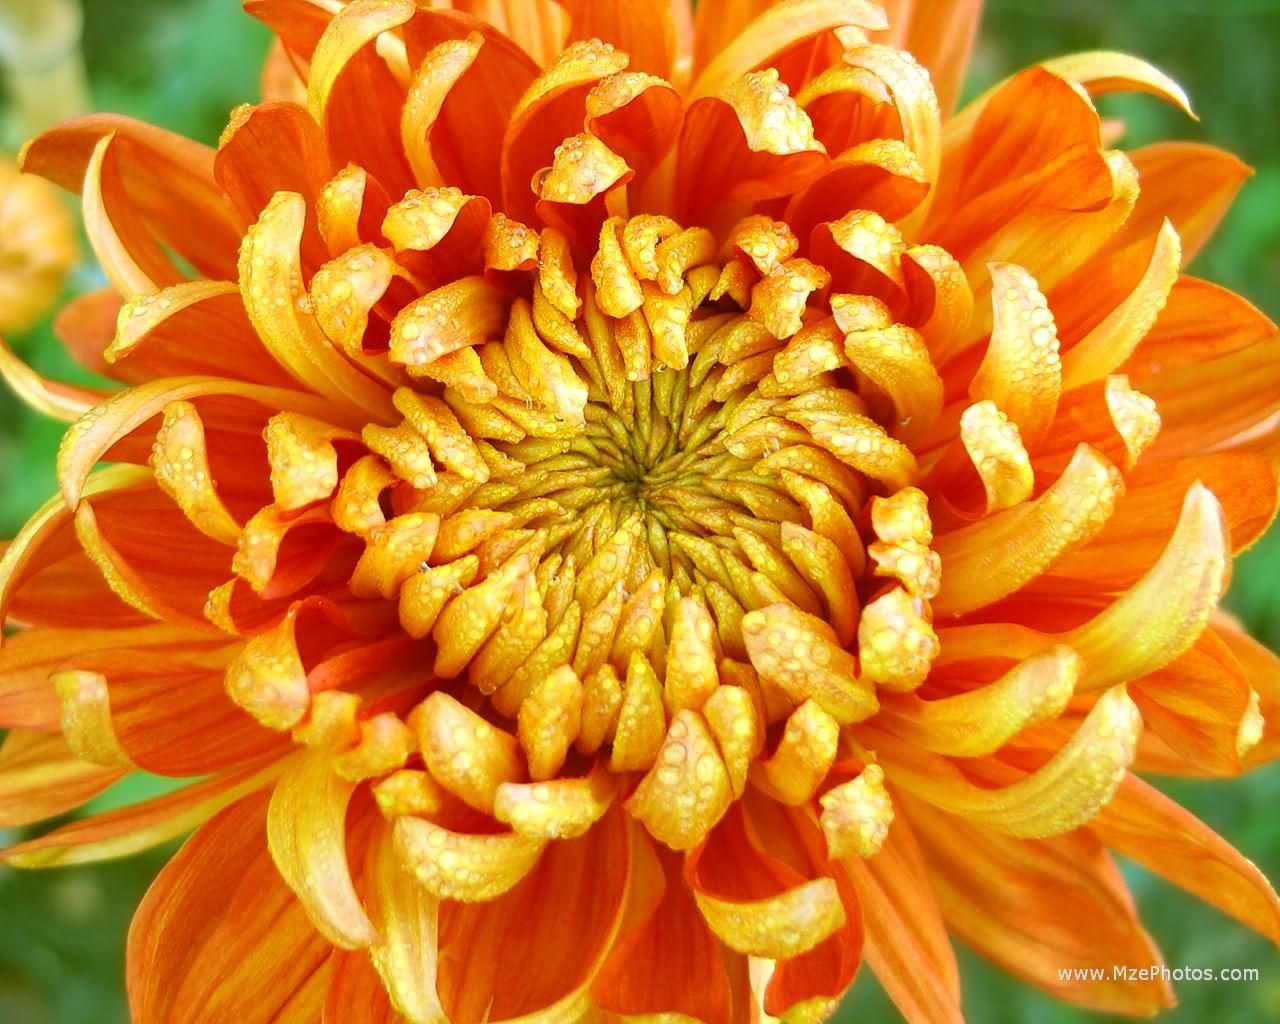 November birth flower chrysthenthemum asher and aristotle joeus